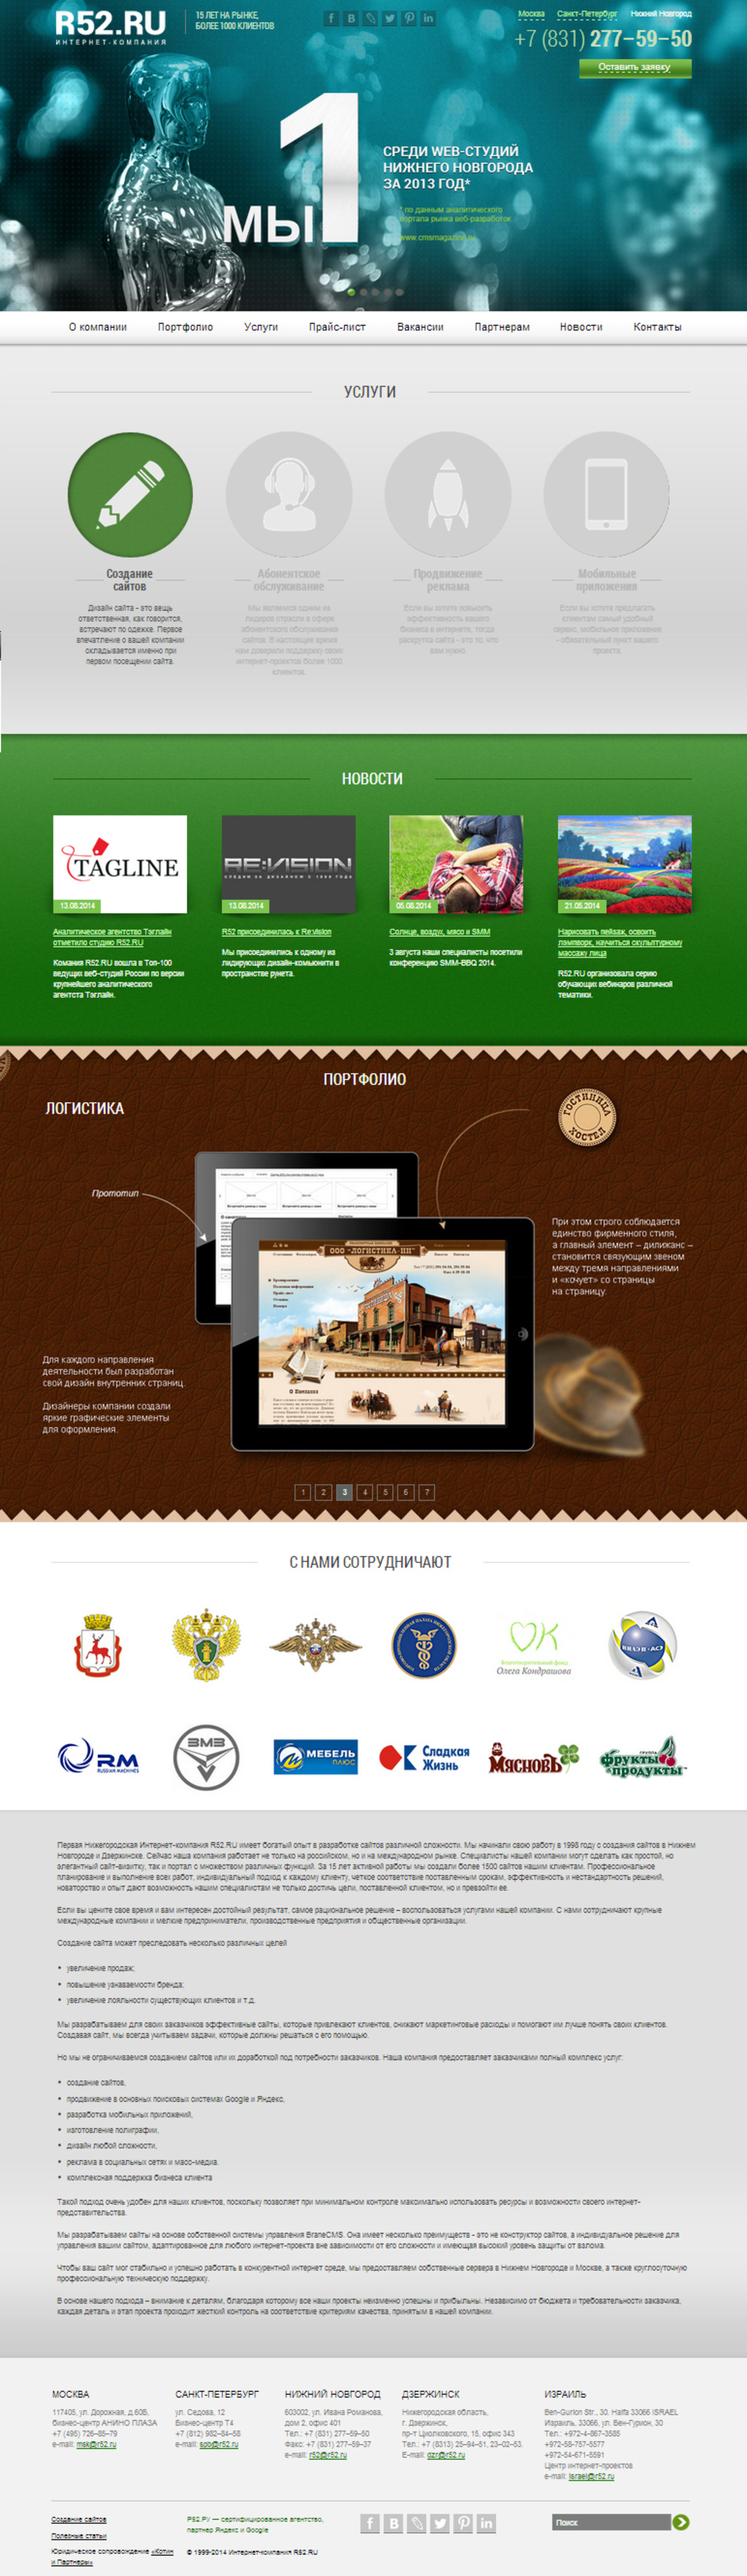 Сайт веб-студии Р52.РУ / Проект компании R52.RU